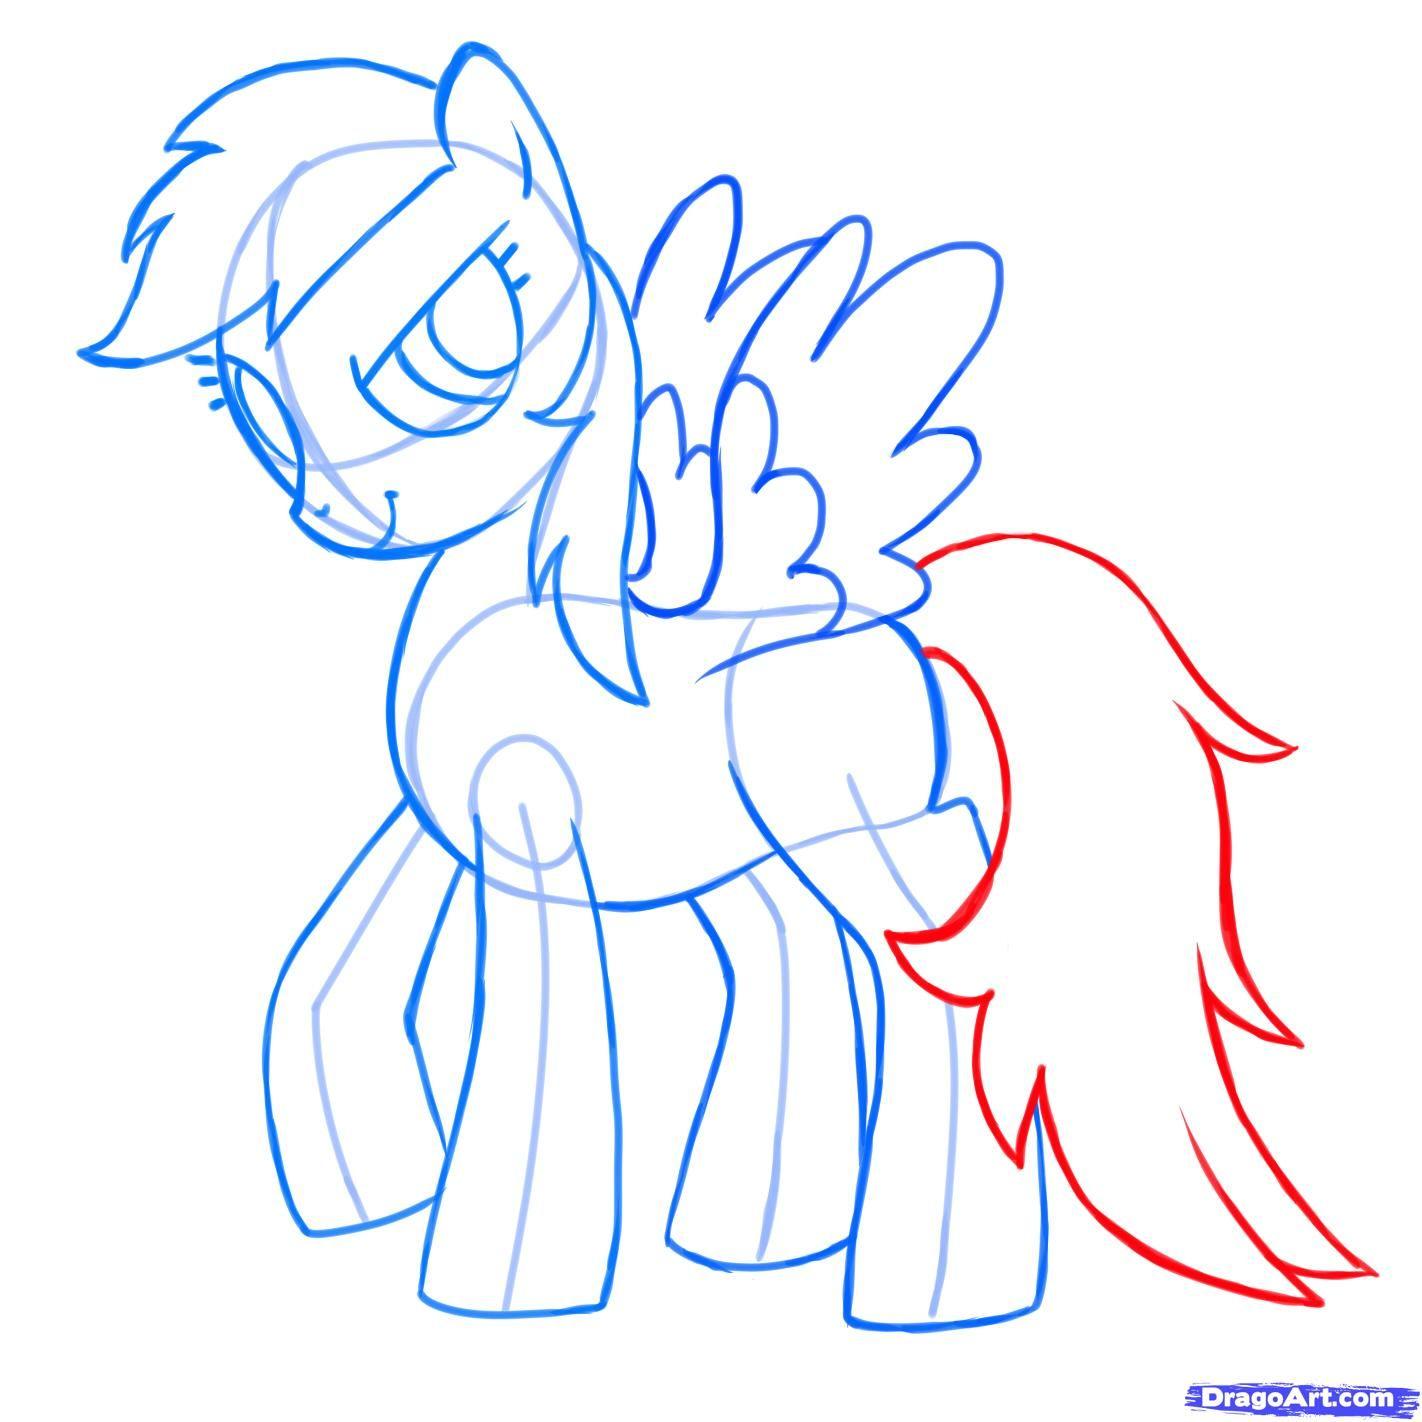 how to draw rainbow dash, my little pony friendship is magic step 8 ...